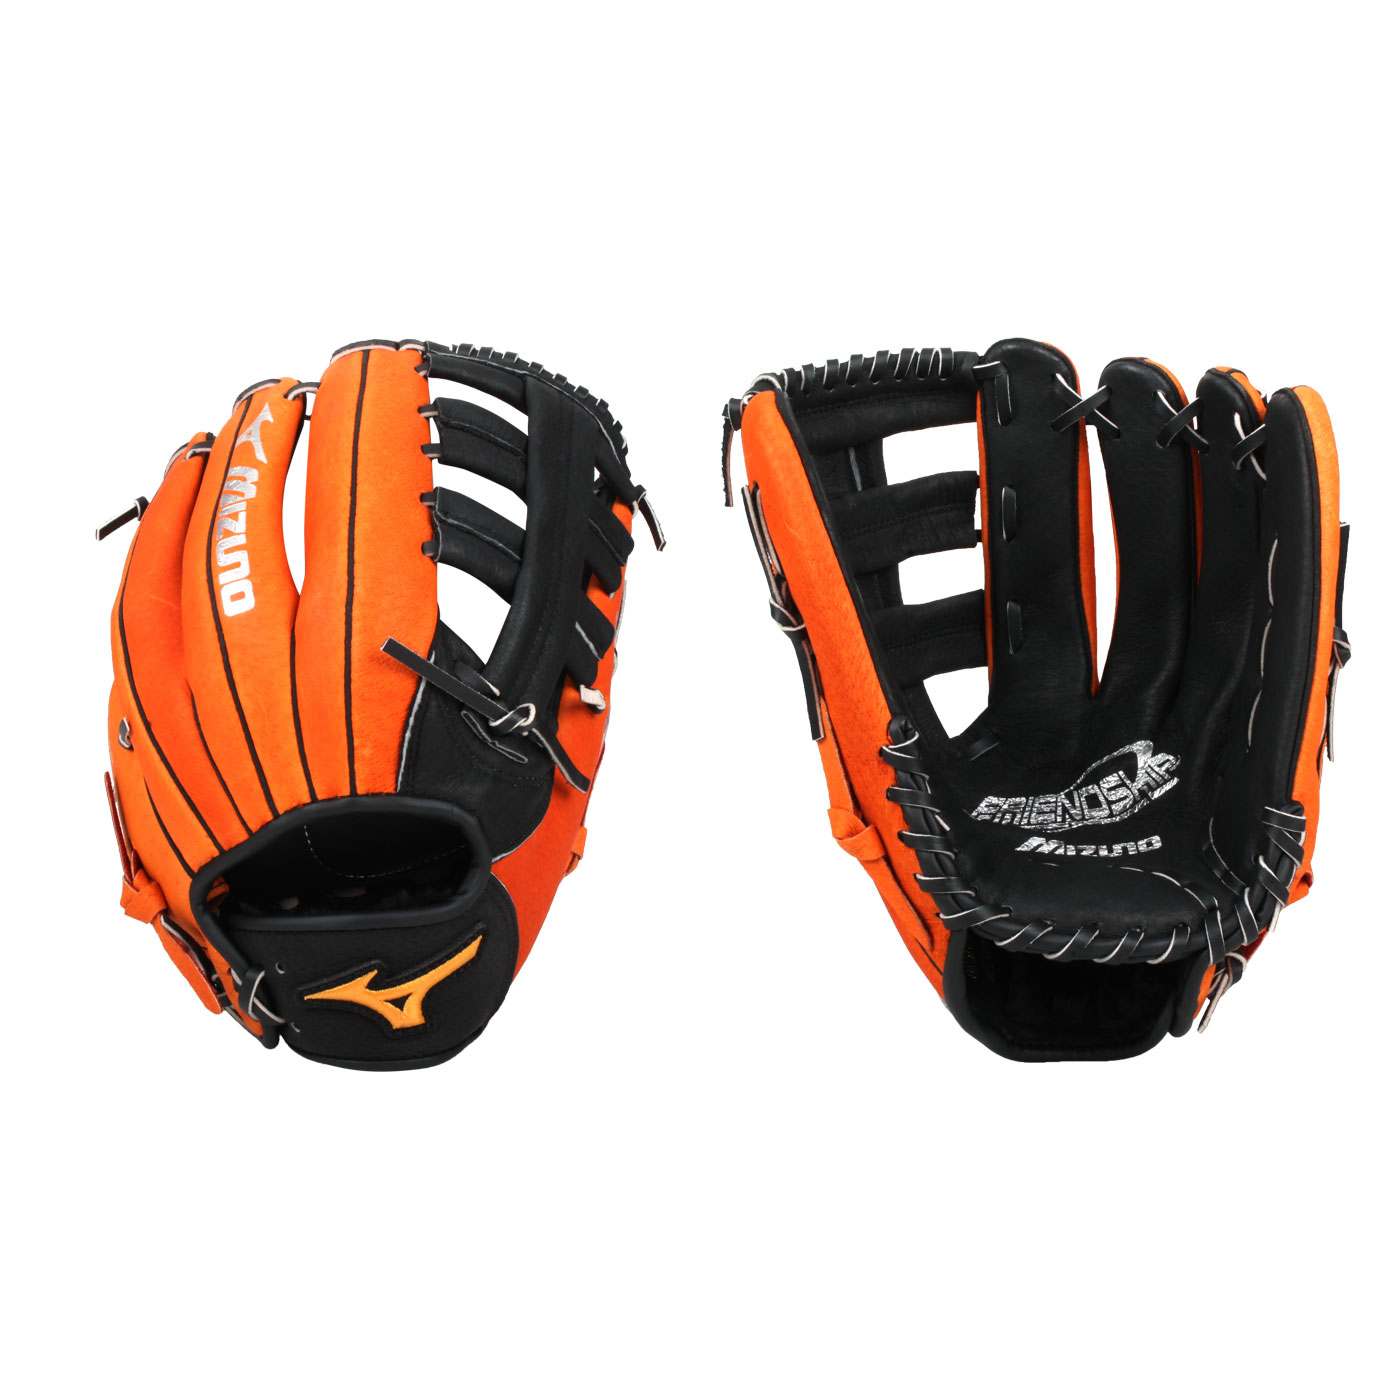 MIZUNO 壘球手套 1ATGS21930-0951 - 橘黑銀